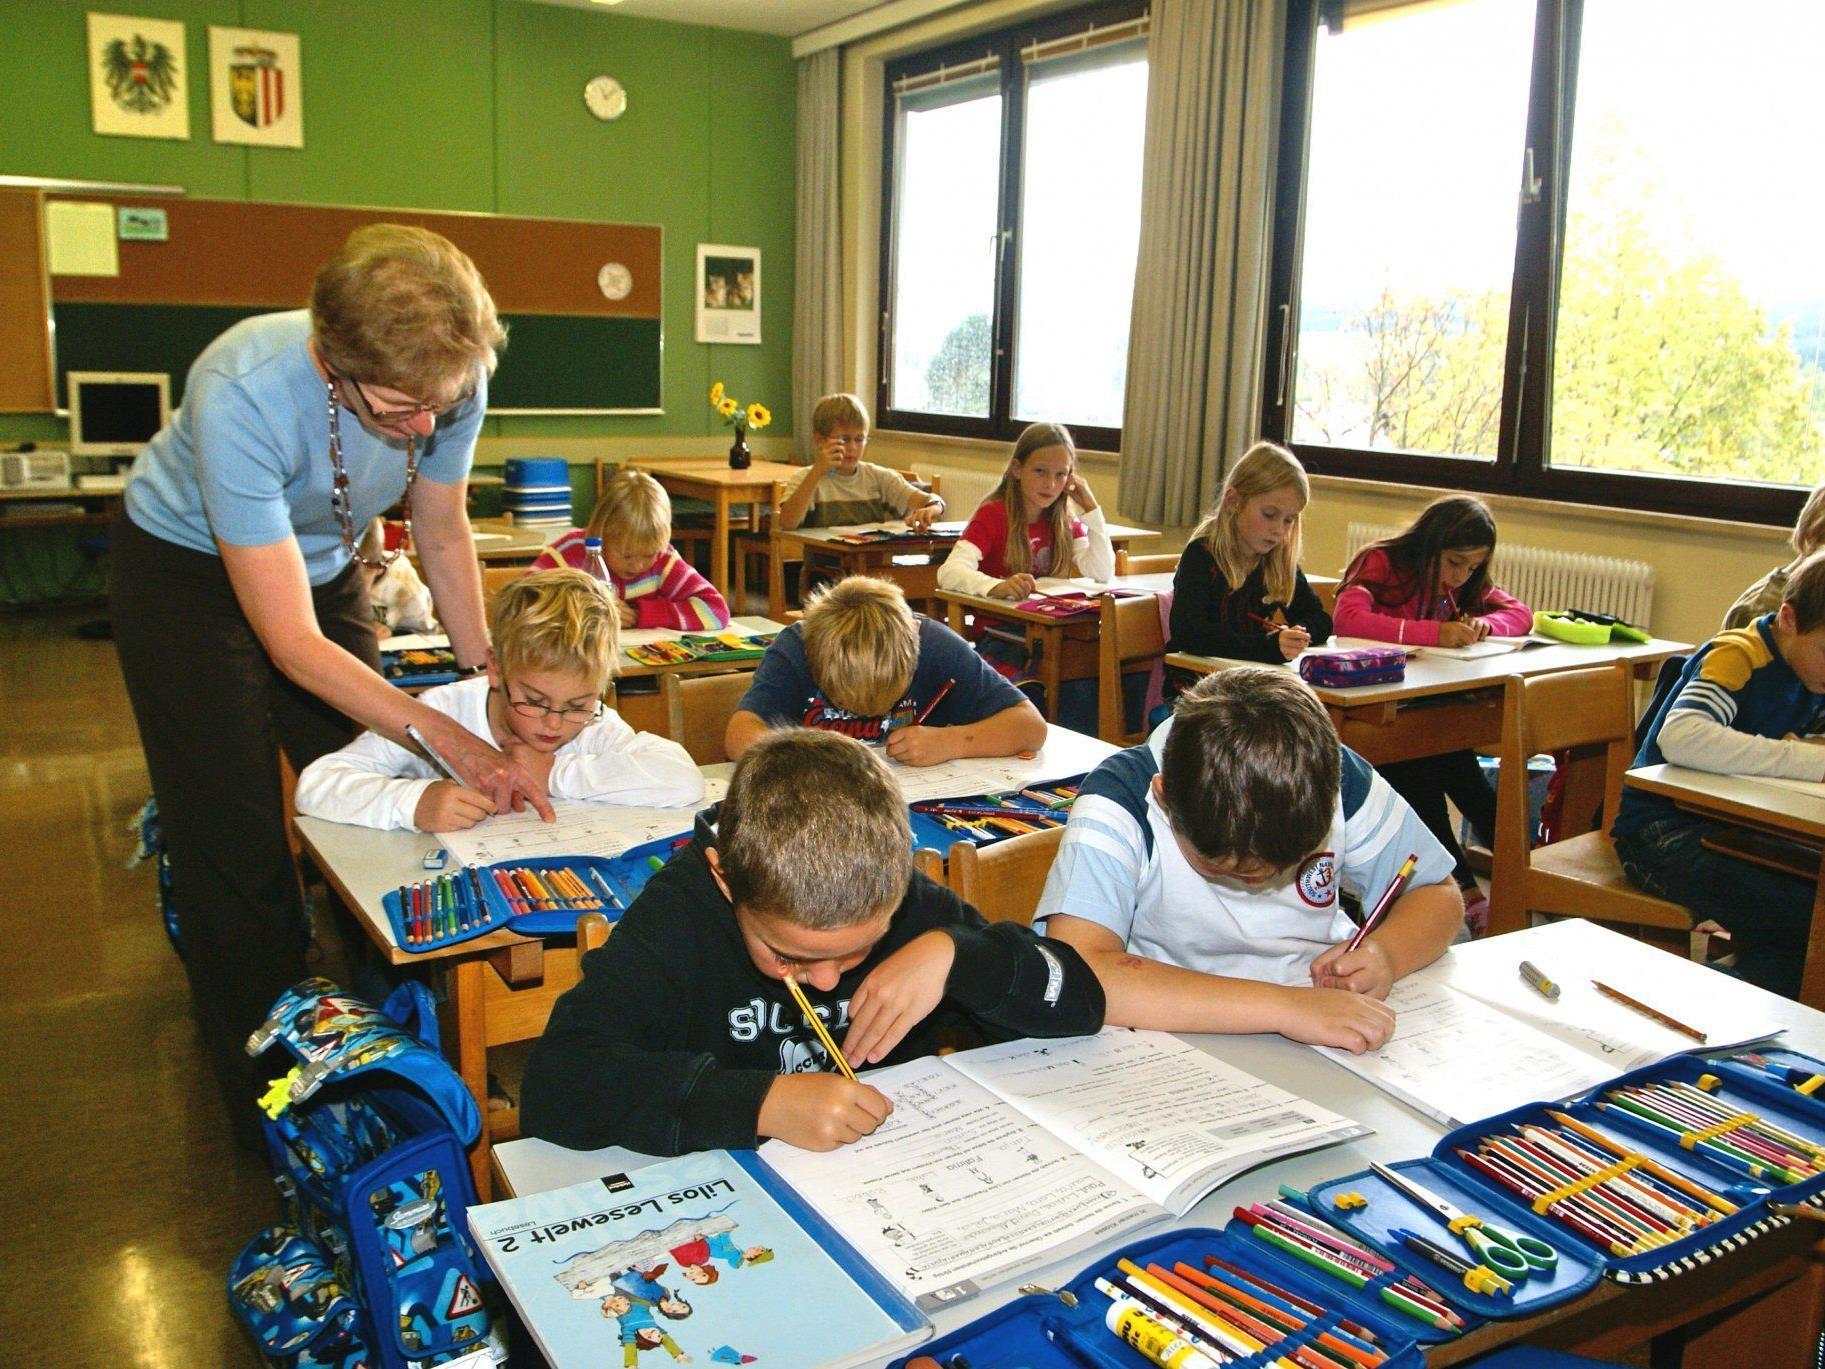 Eine Schule in Wien-Meidling soll wegen Vandalismus eingezäunt werden.